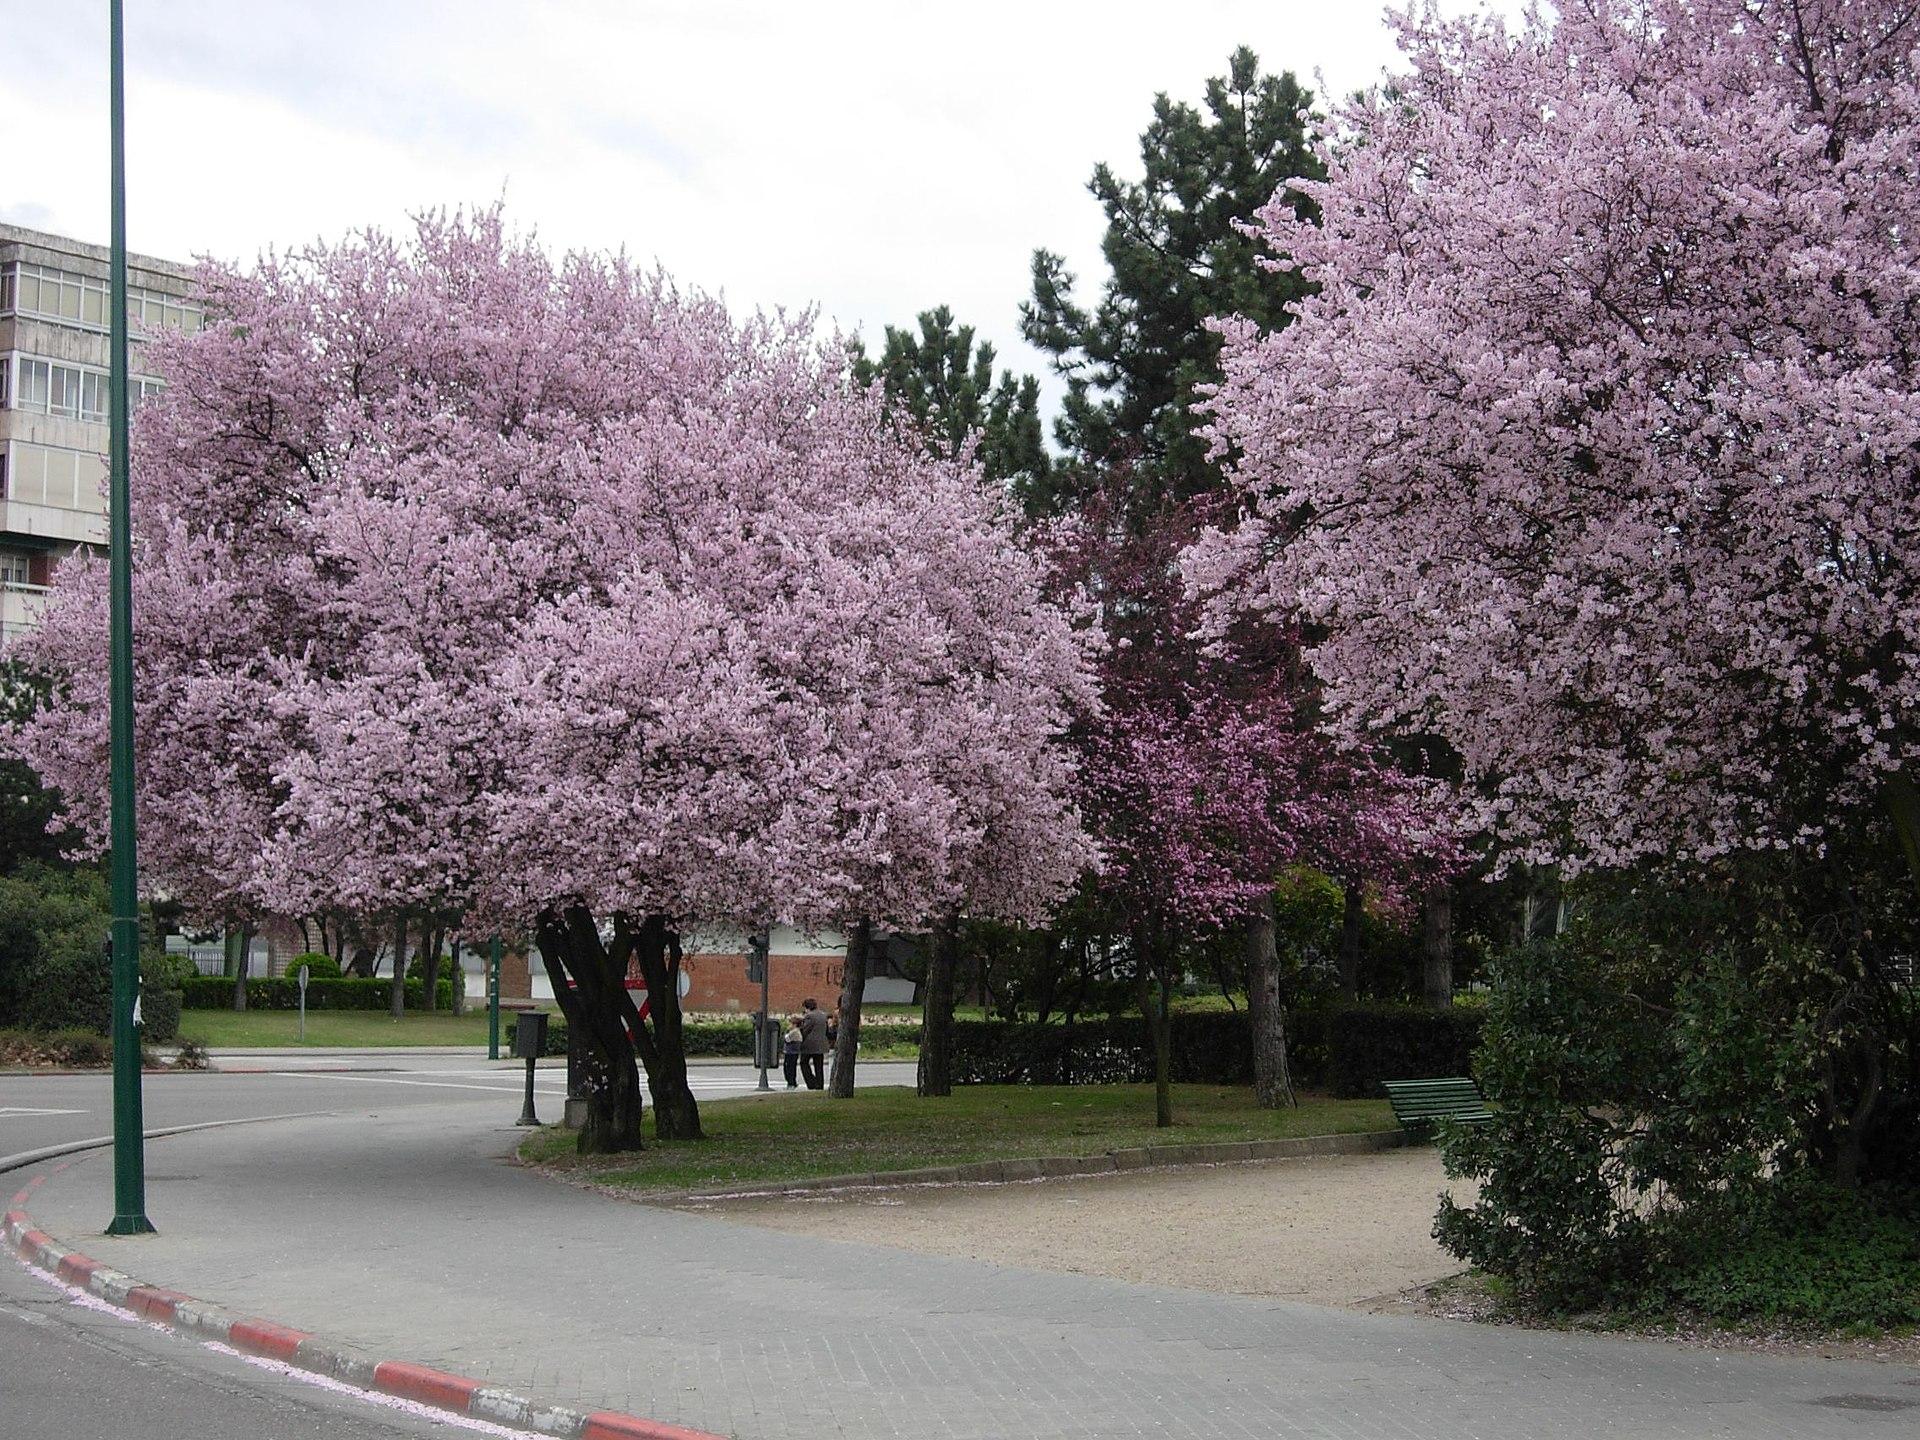 Rbol frutal wikipedia la enciclopedia libre for Arboles de poca raiz para jardin